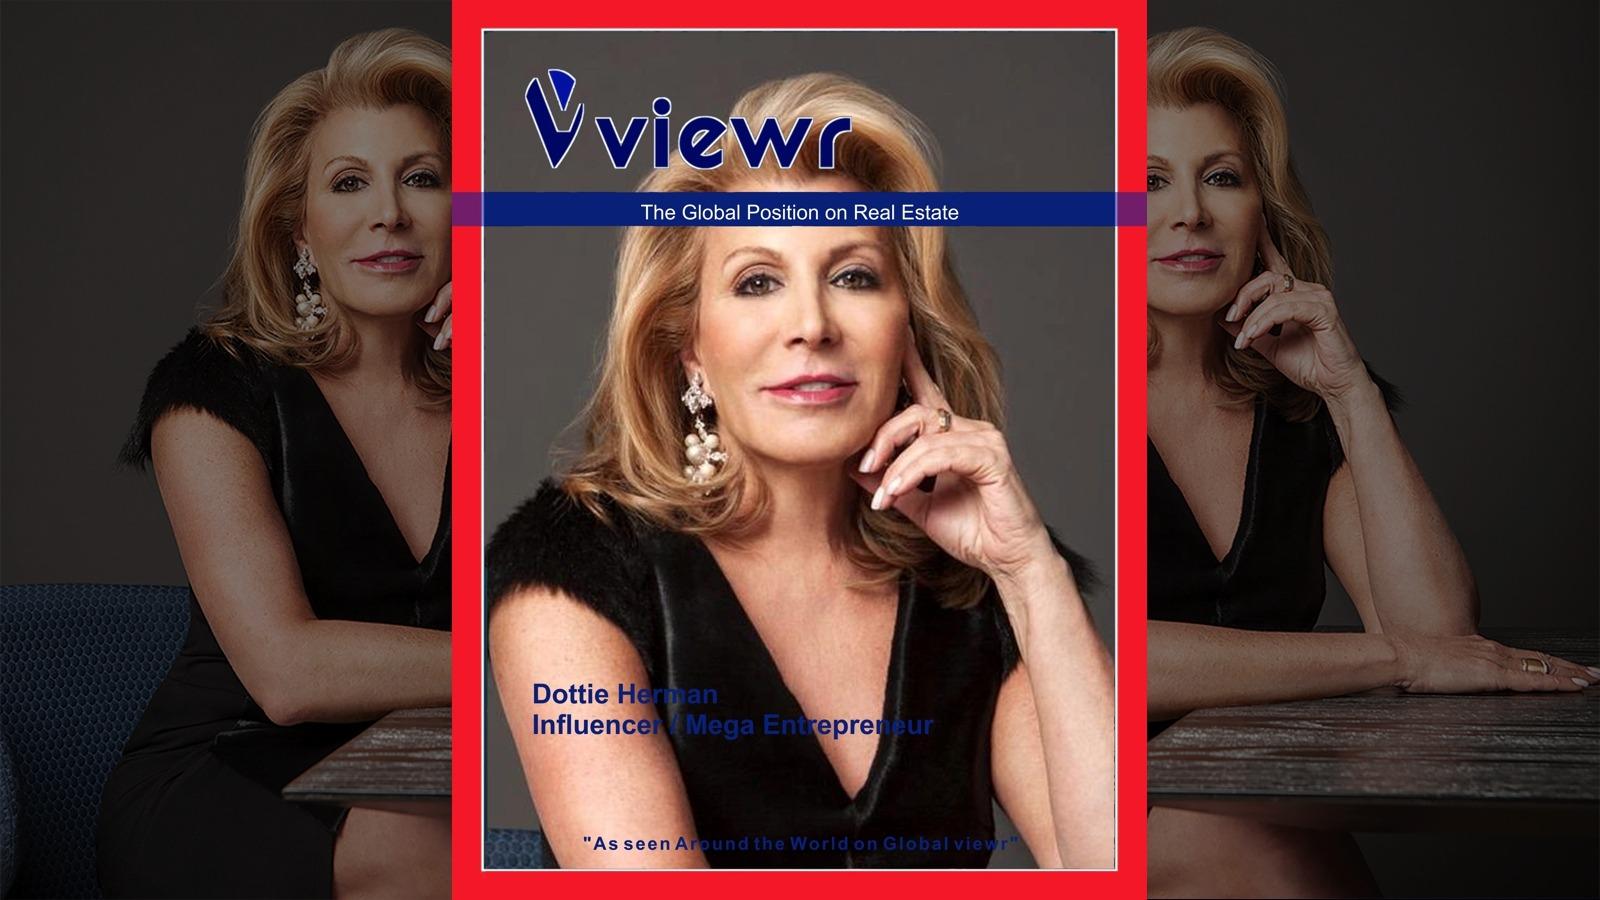 Dottie Herman on Global viewr Magazine